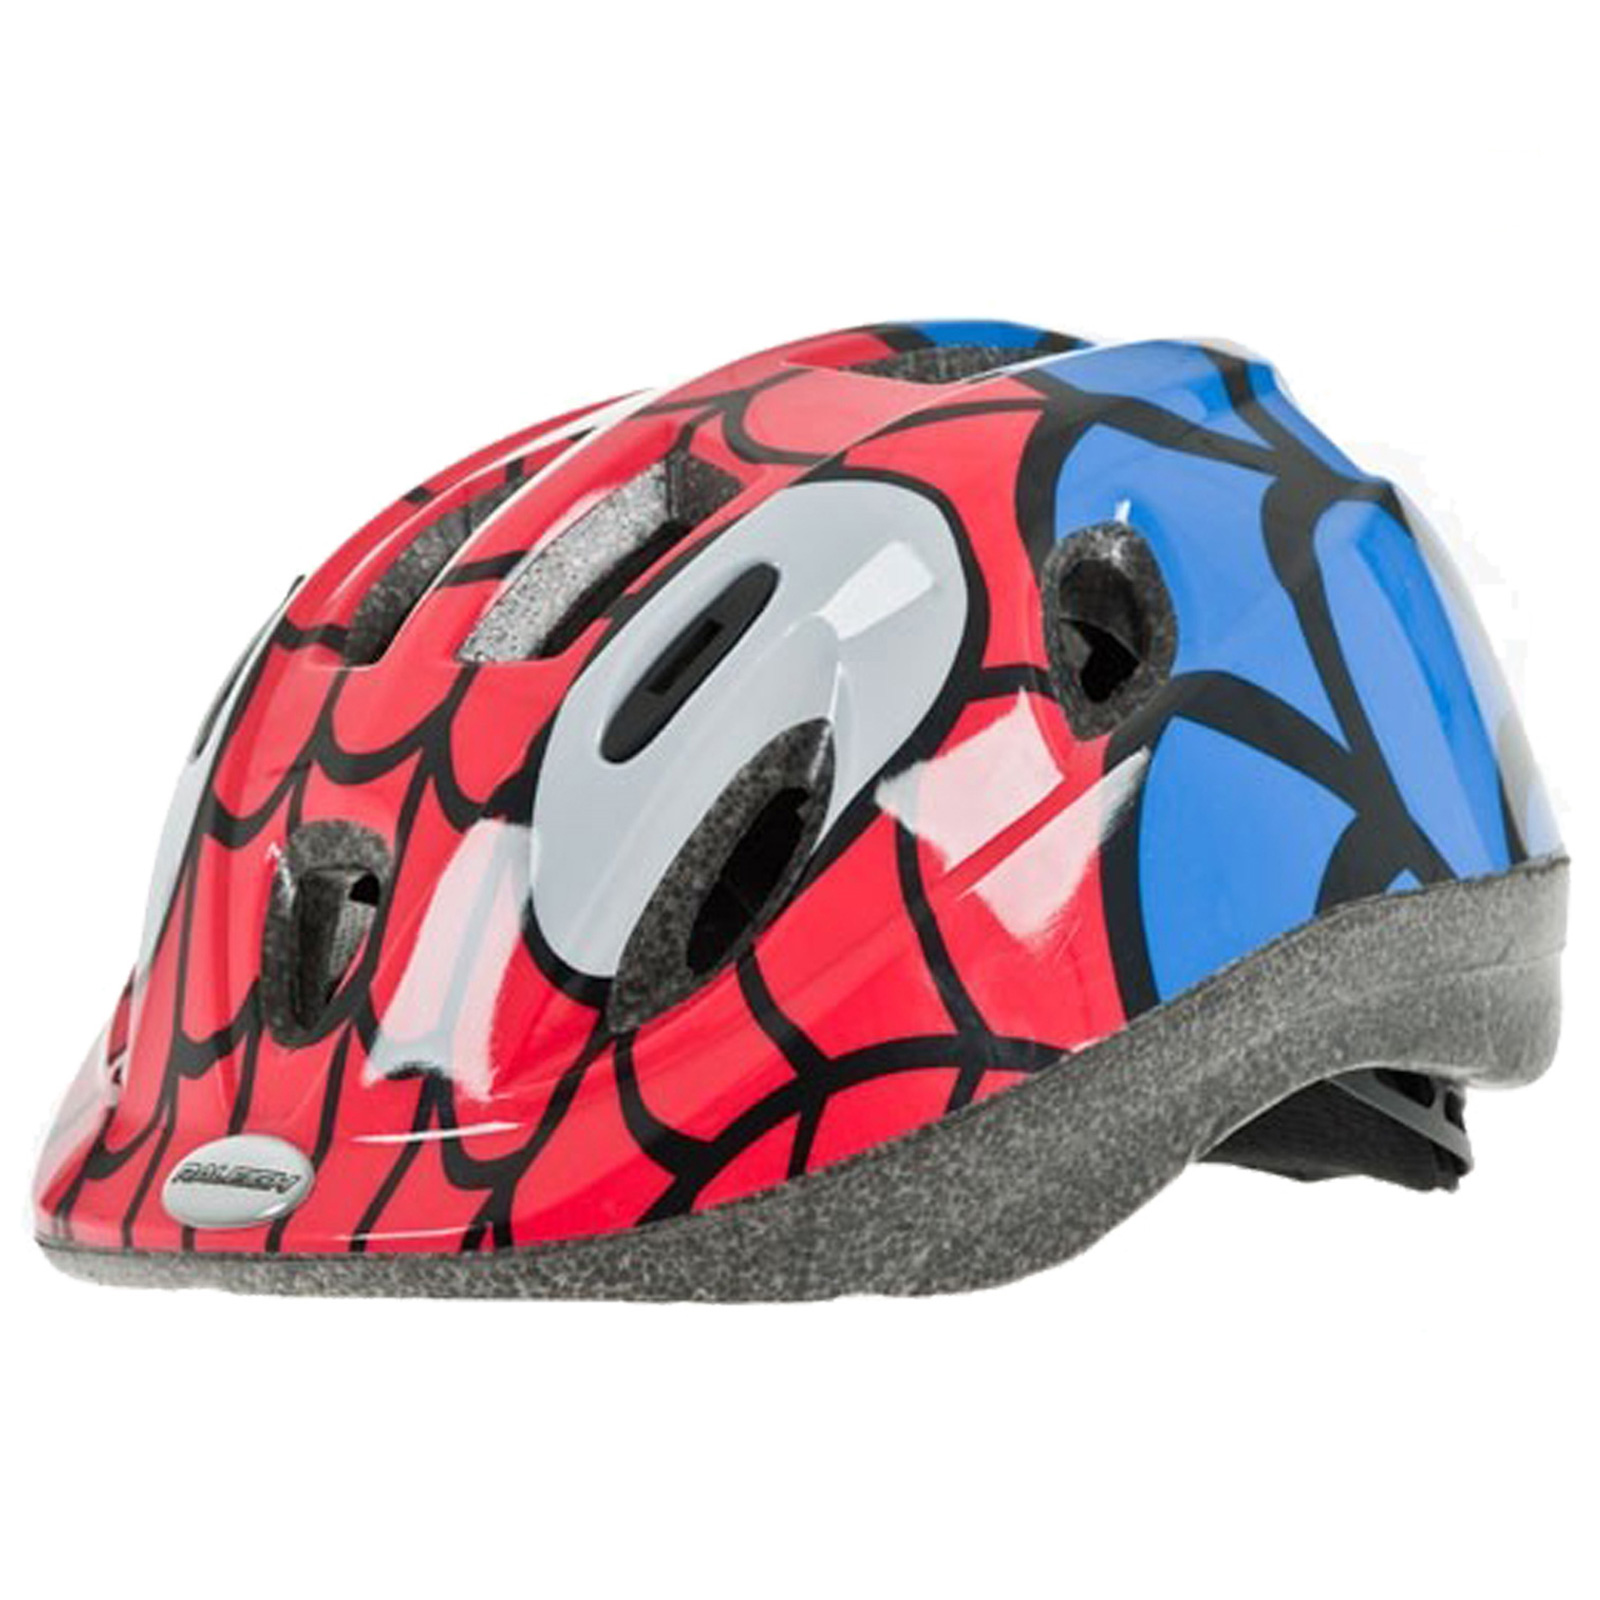 Raleigh Mystery Bandit Spiderman Boys Kids Bike Cycle